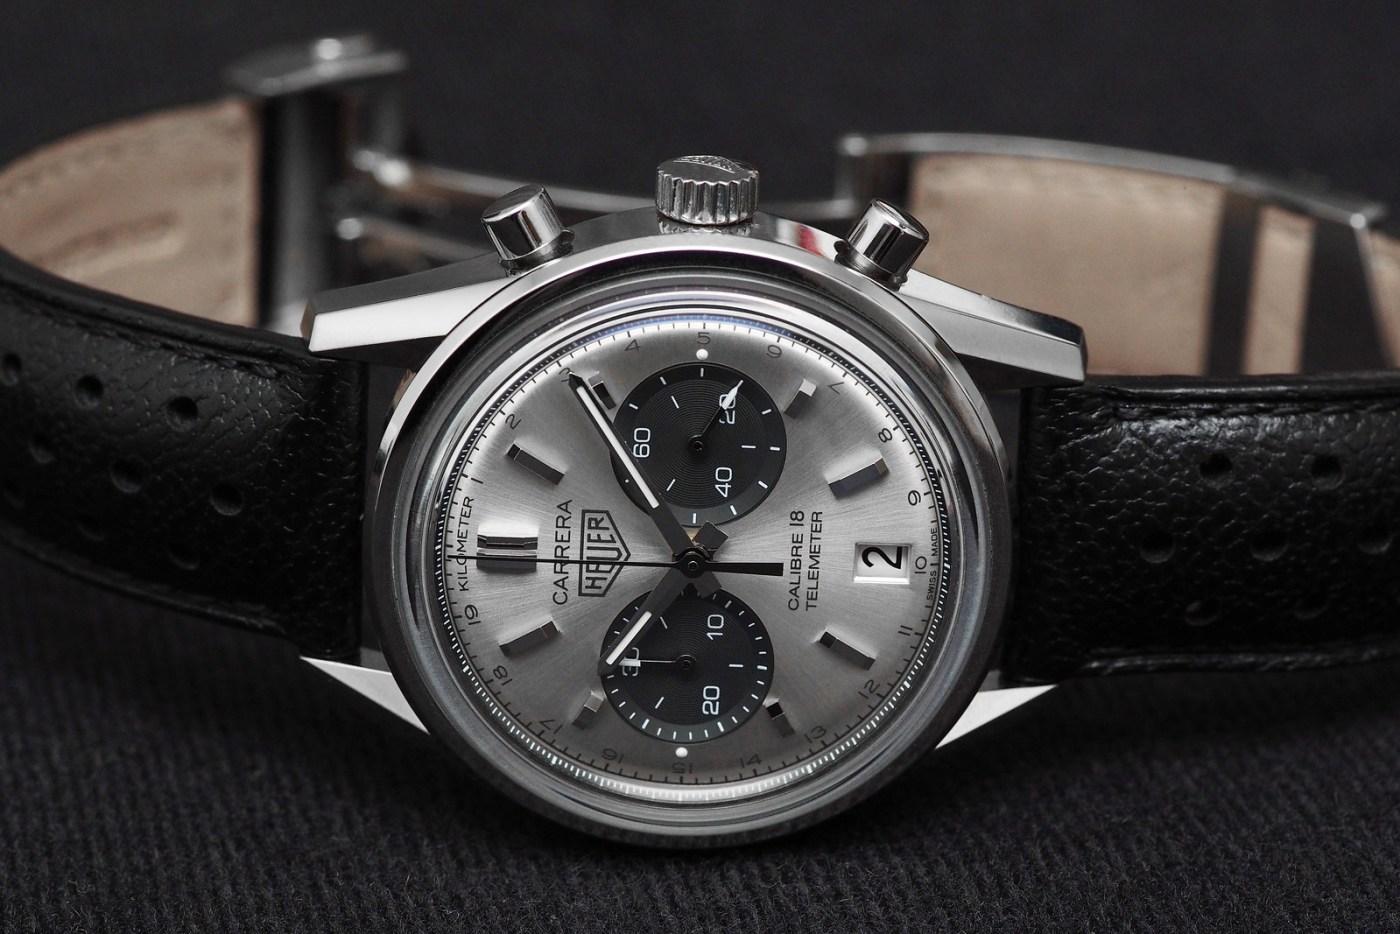 TAG Heuer Carrera Calibre 18 Automatic Chronograph